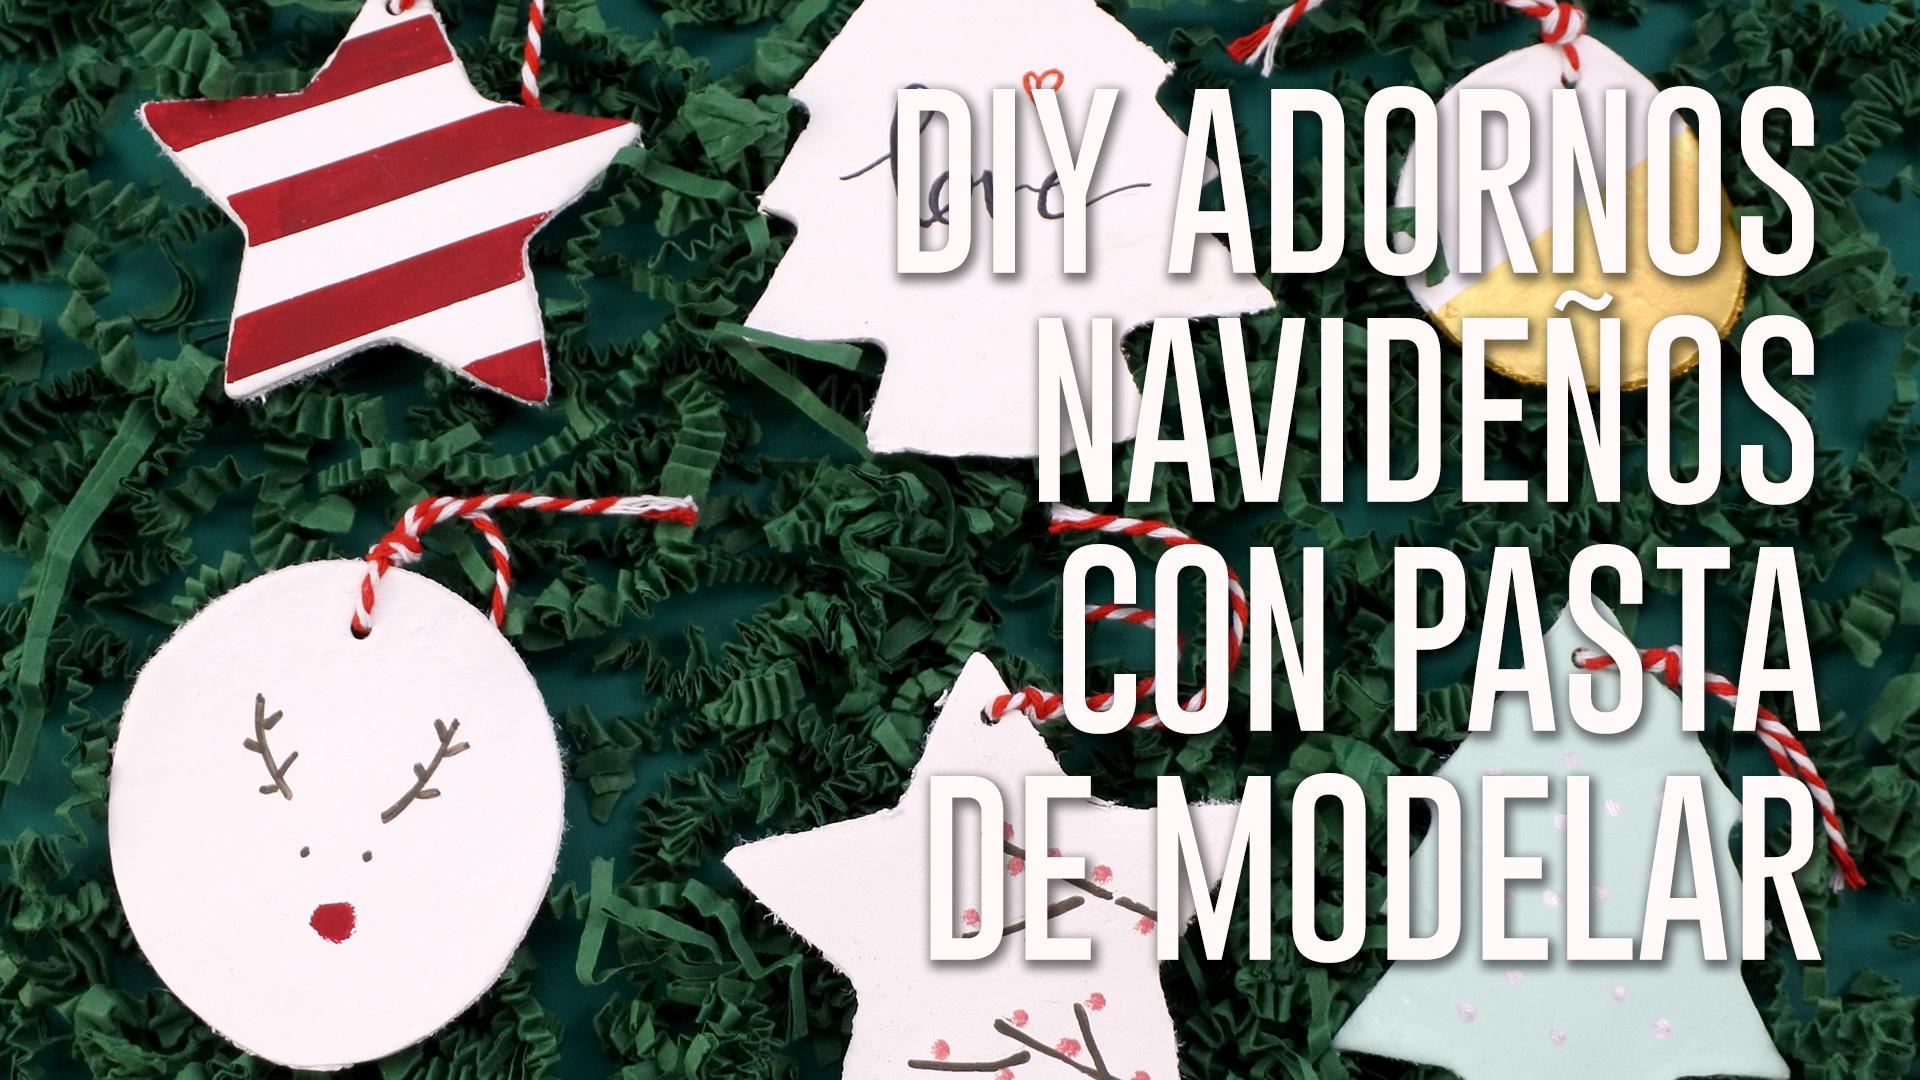 JIPIJAPAS DIY ADORNOS NAVIDEÑOS PASTA MODELAR_00001